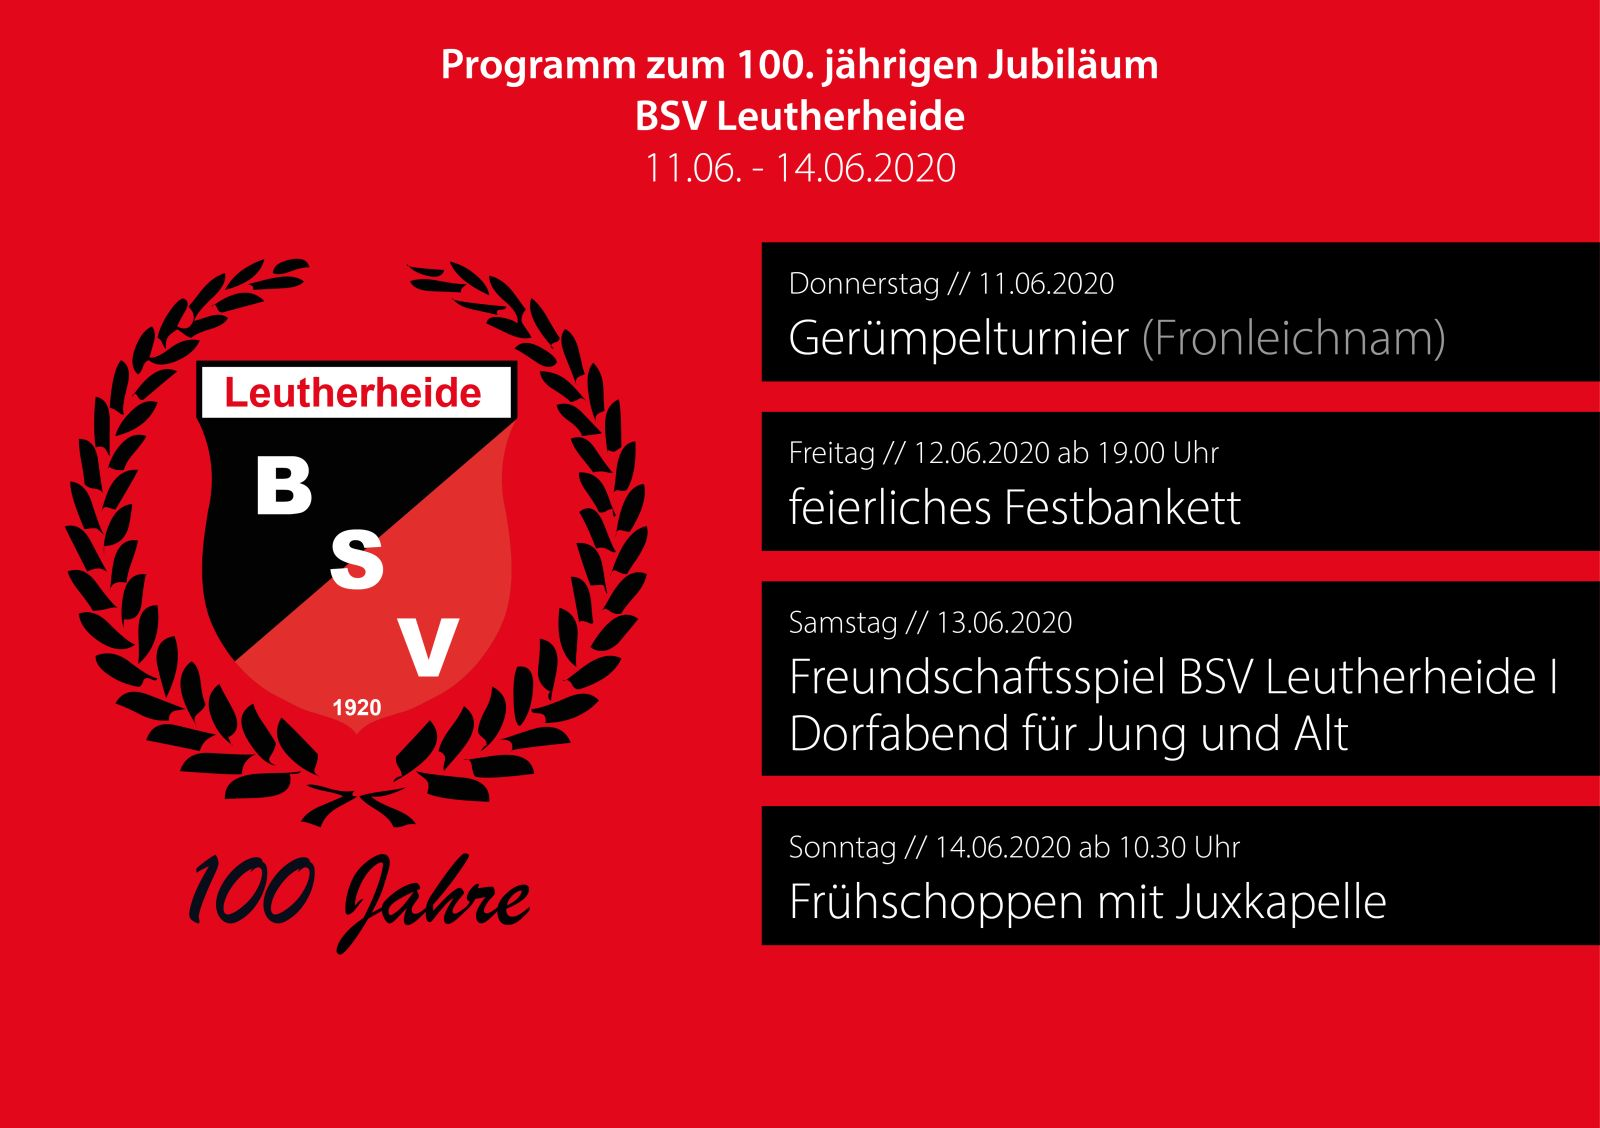 100 Jahre BSV Leutherheide